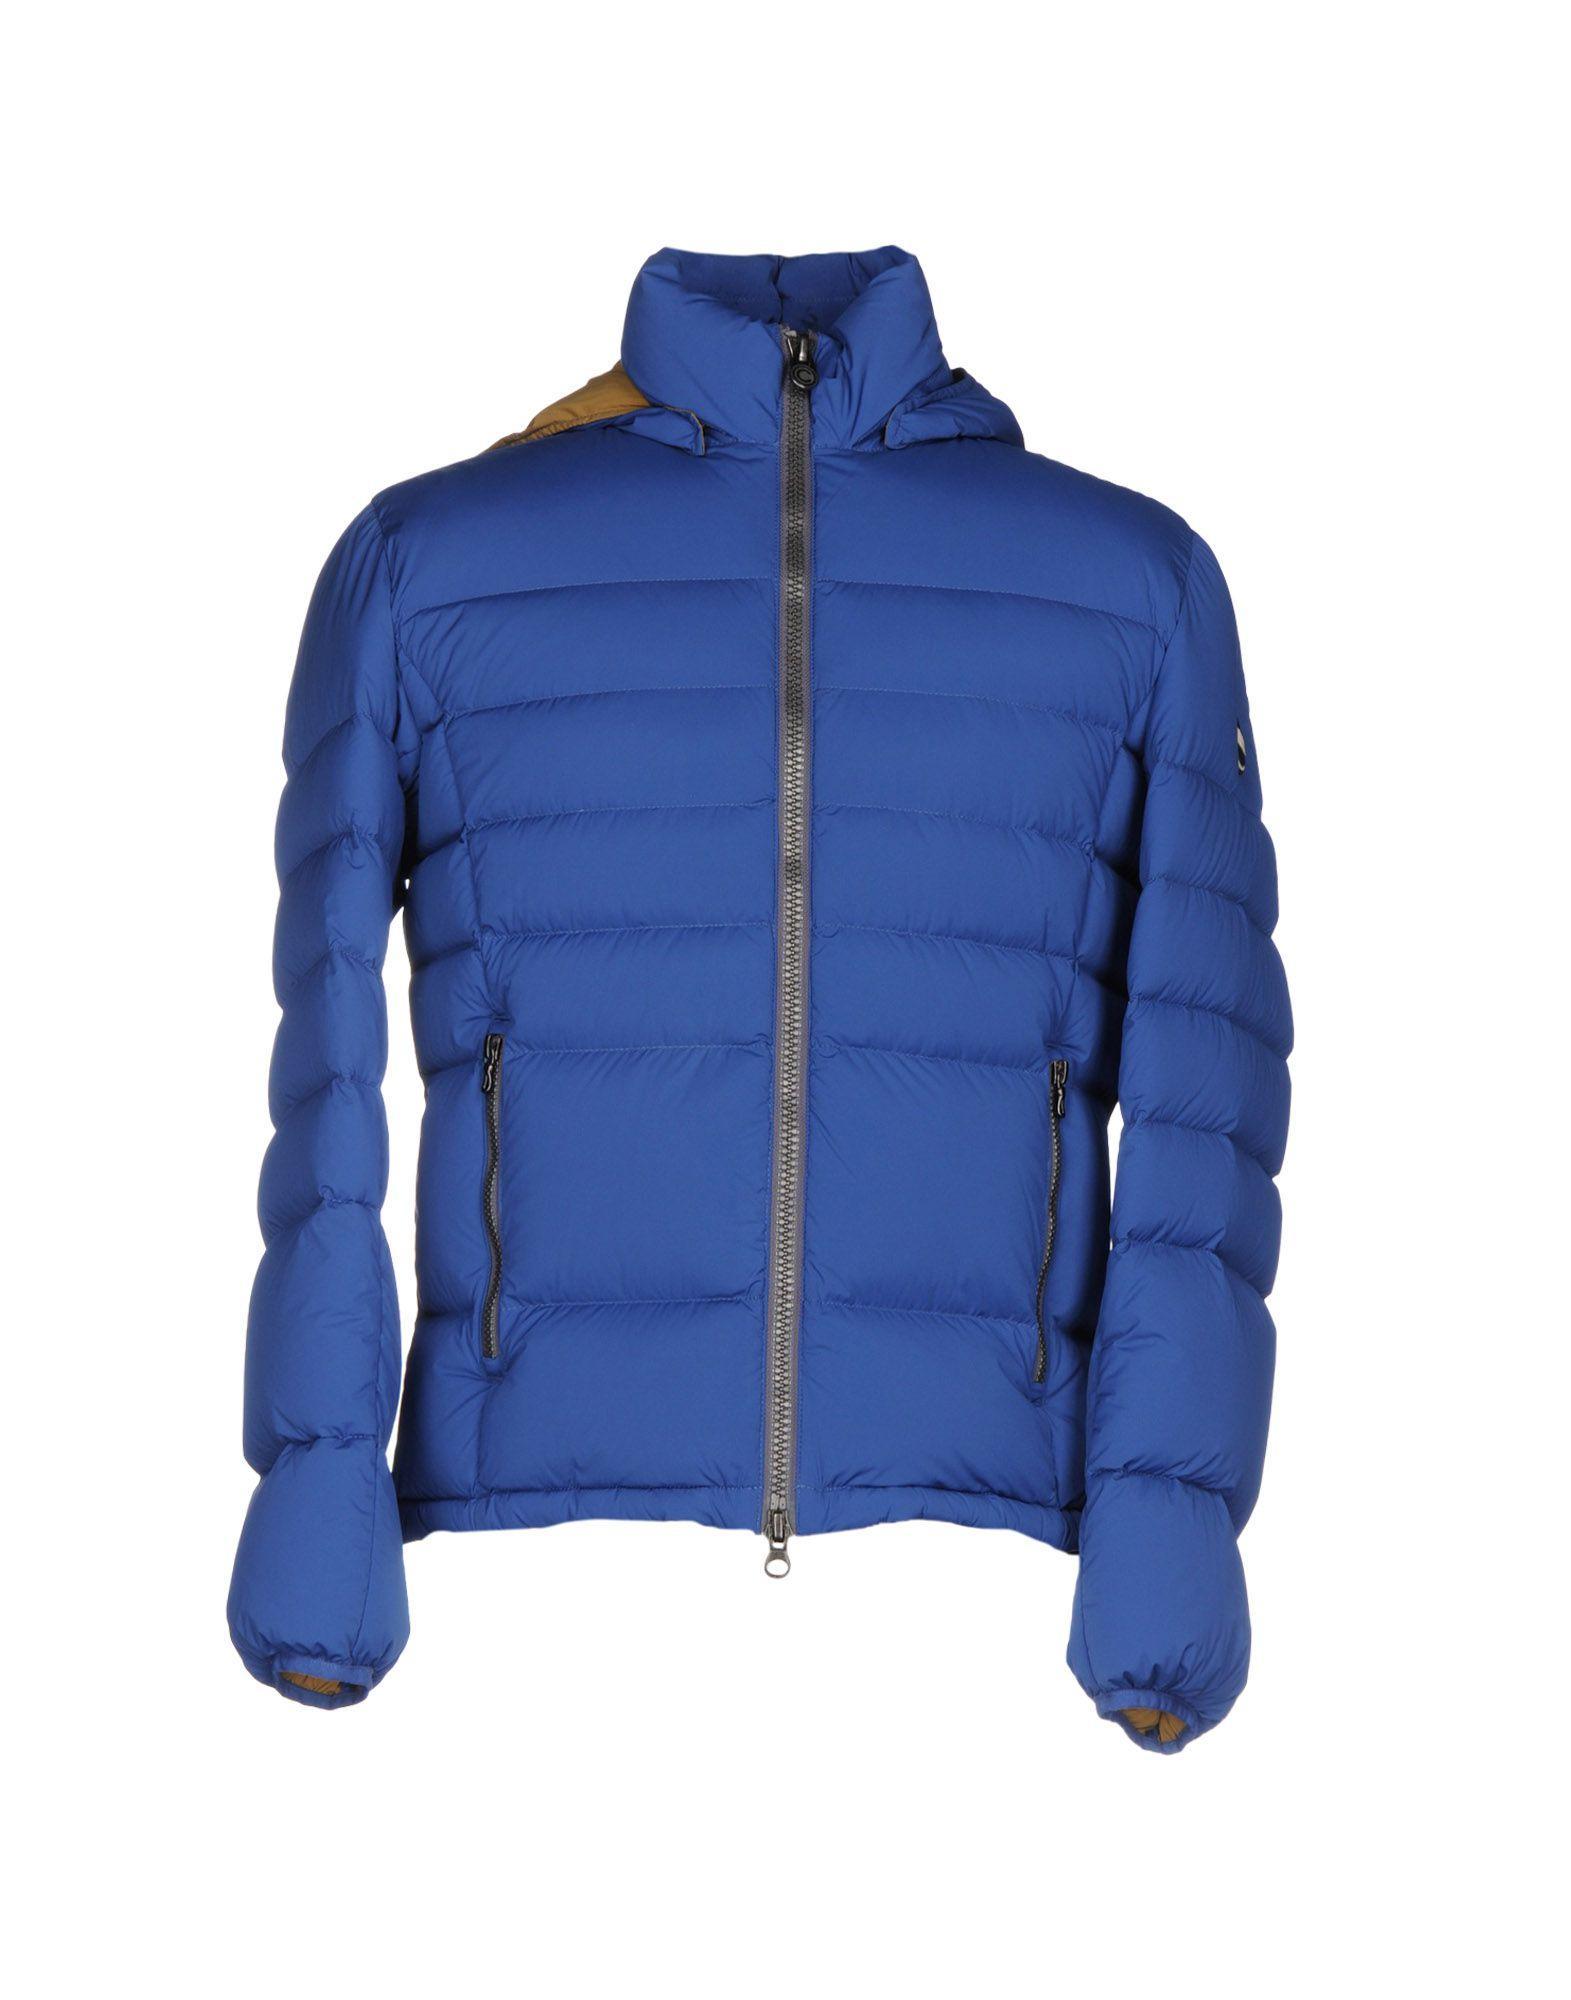 Colmar Originals Down Jackets In Blue